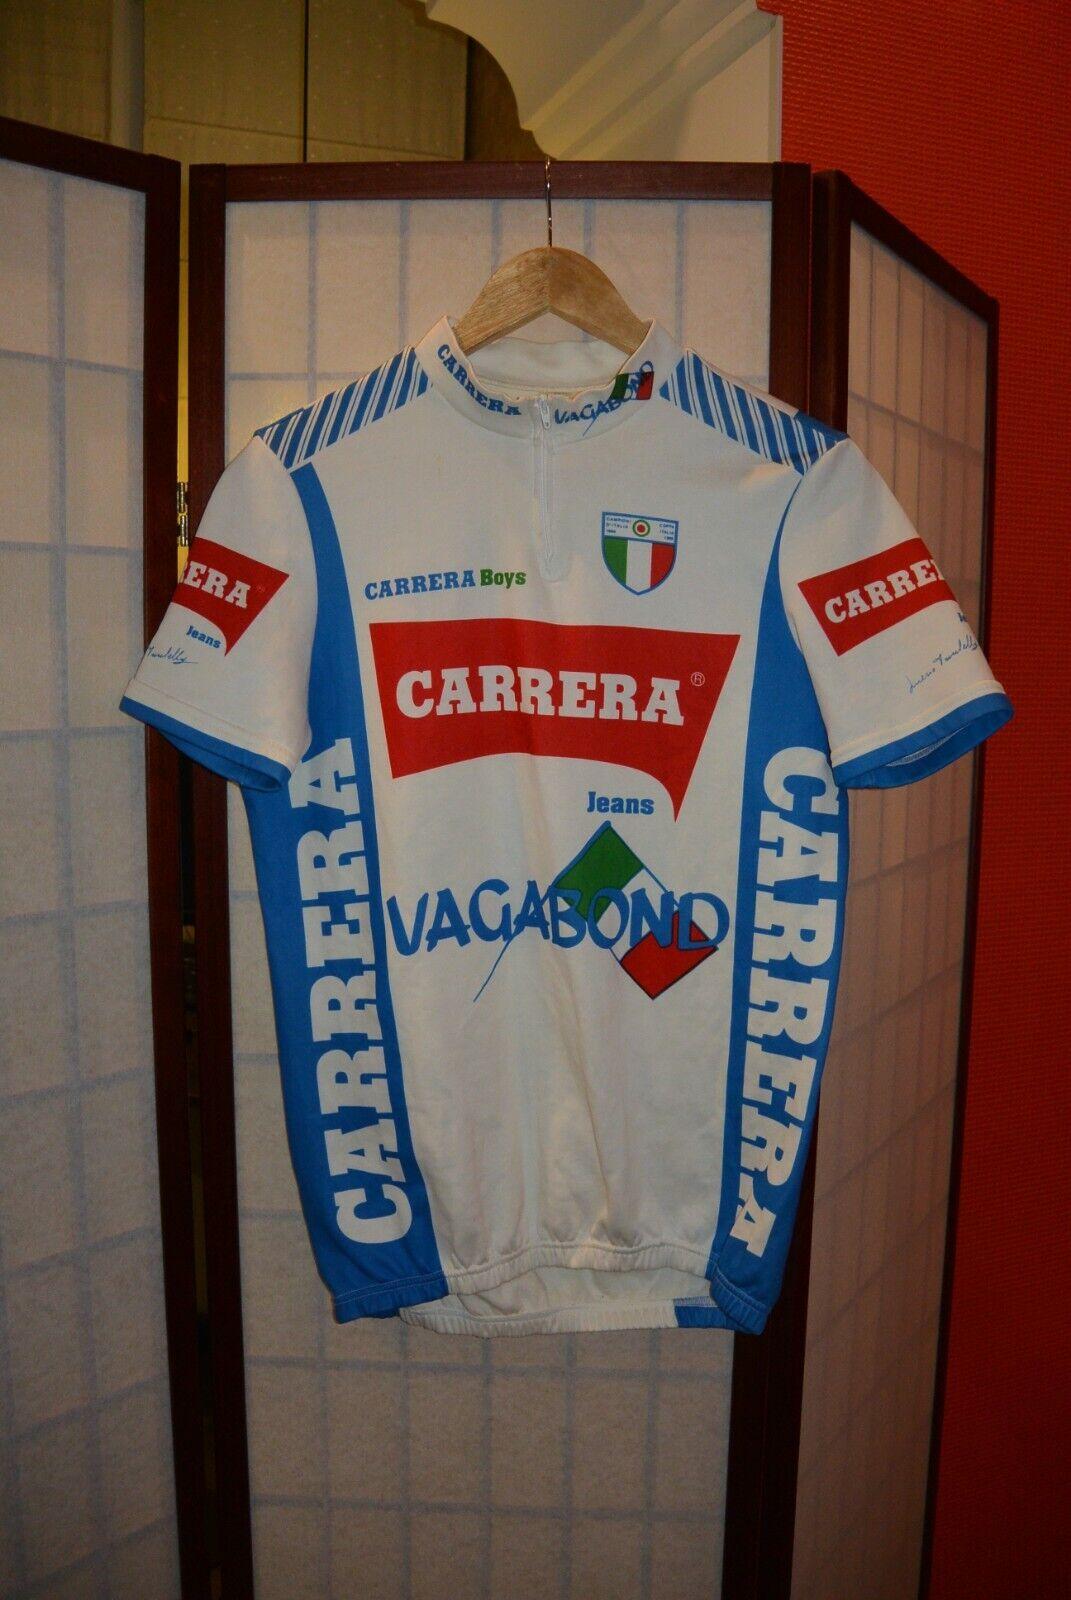 Carrera  Vagabond Campioni d'Italia 1996 old retro cycling jersey